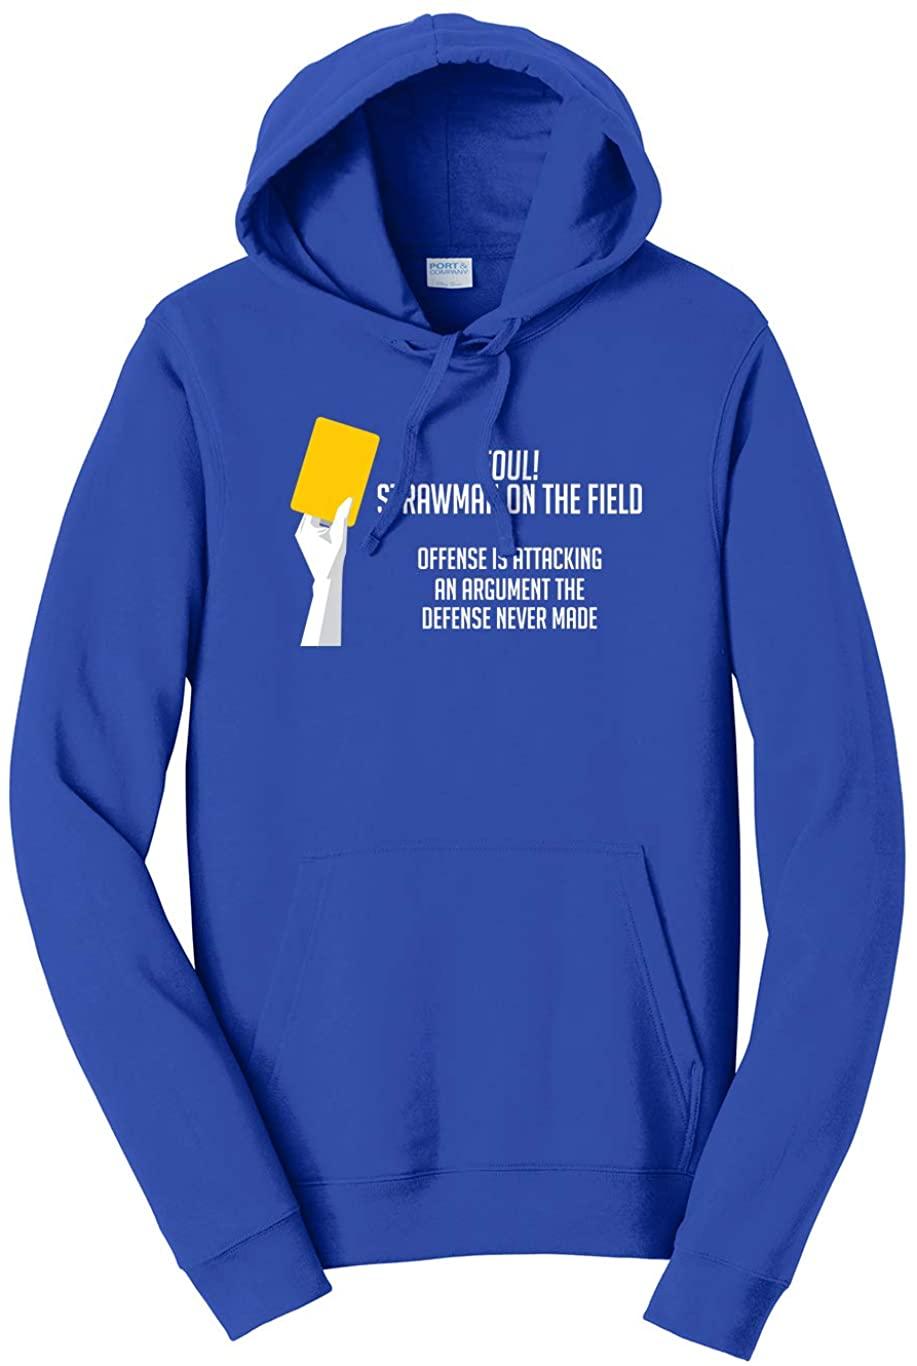 Tenacitee Unisex Strawman Logical Fallacy Hooded Sweatshirt